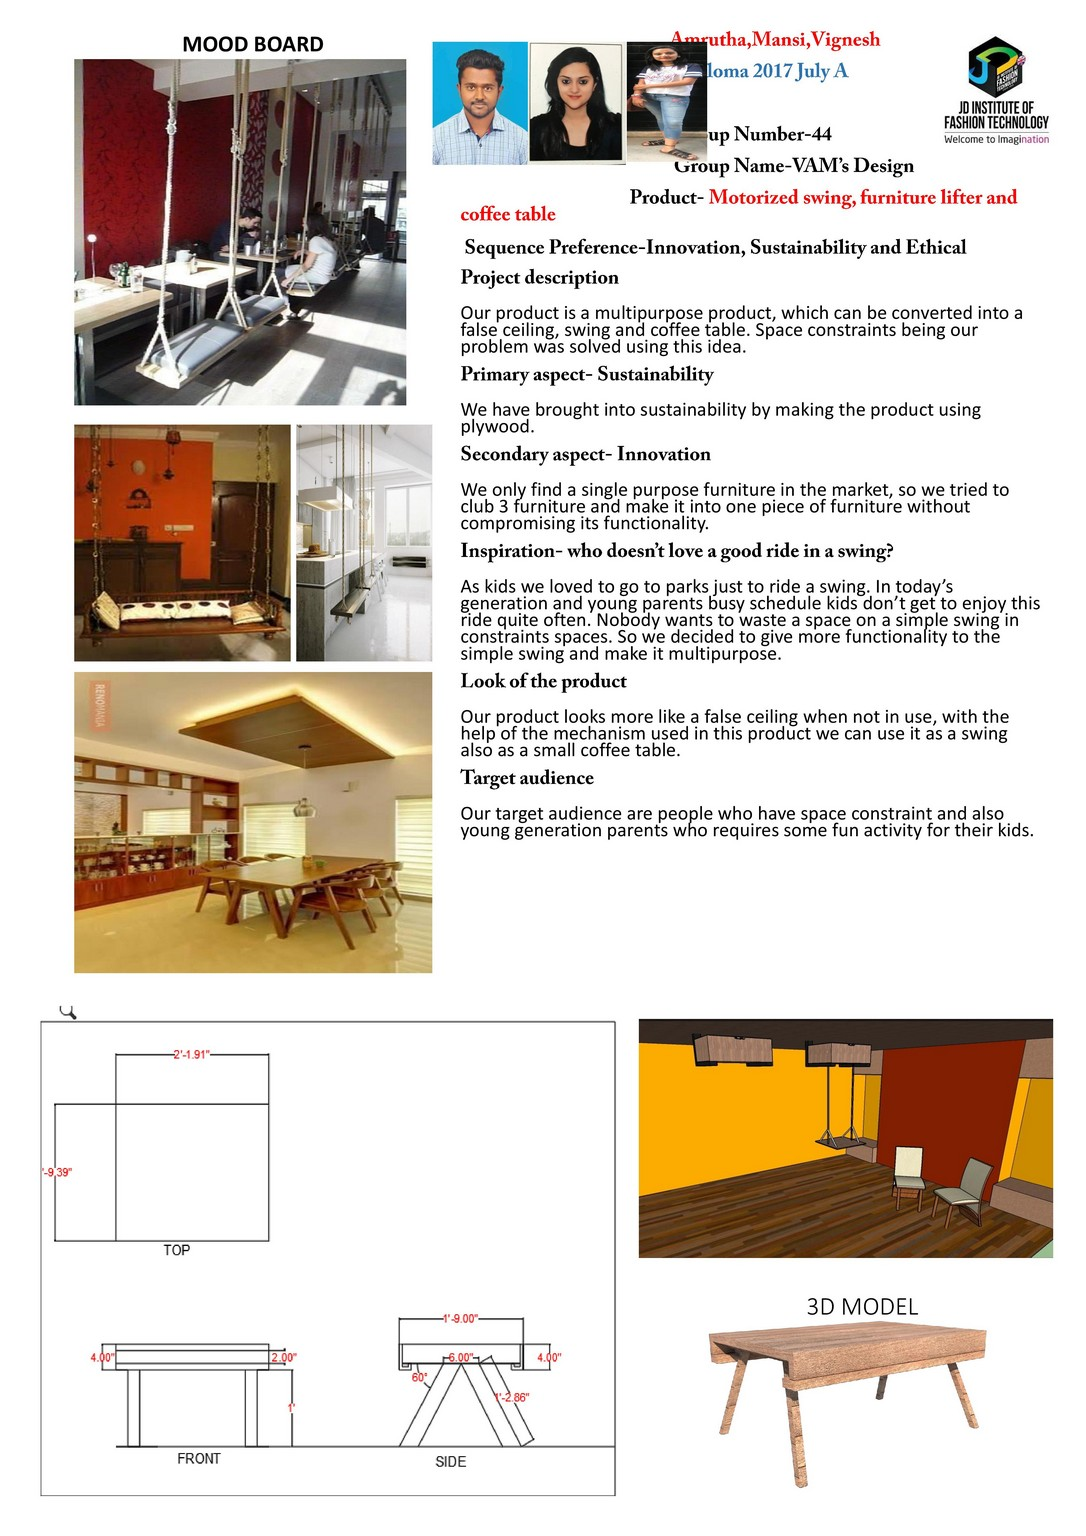 Vam's Design – Change – JD Annual Design Awards 2018 | Designer: Amrutha, Mansi and vignesh | Photography : Jerin Nath (@jerin_nath) vam's design - vams design1 - Vam's Design – Change – JD Annual Design Awards 2018